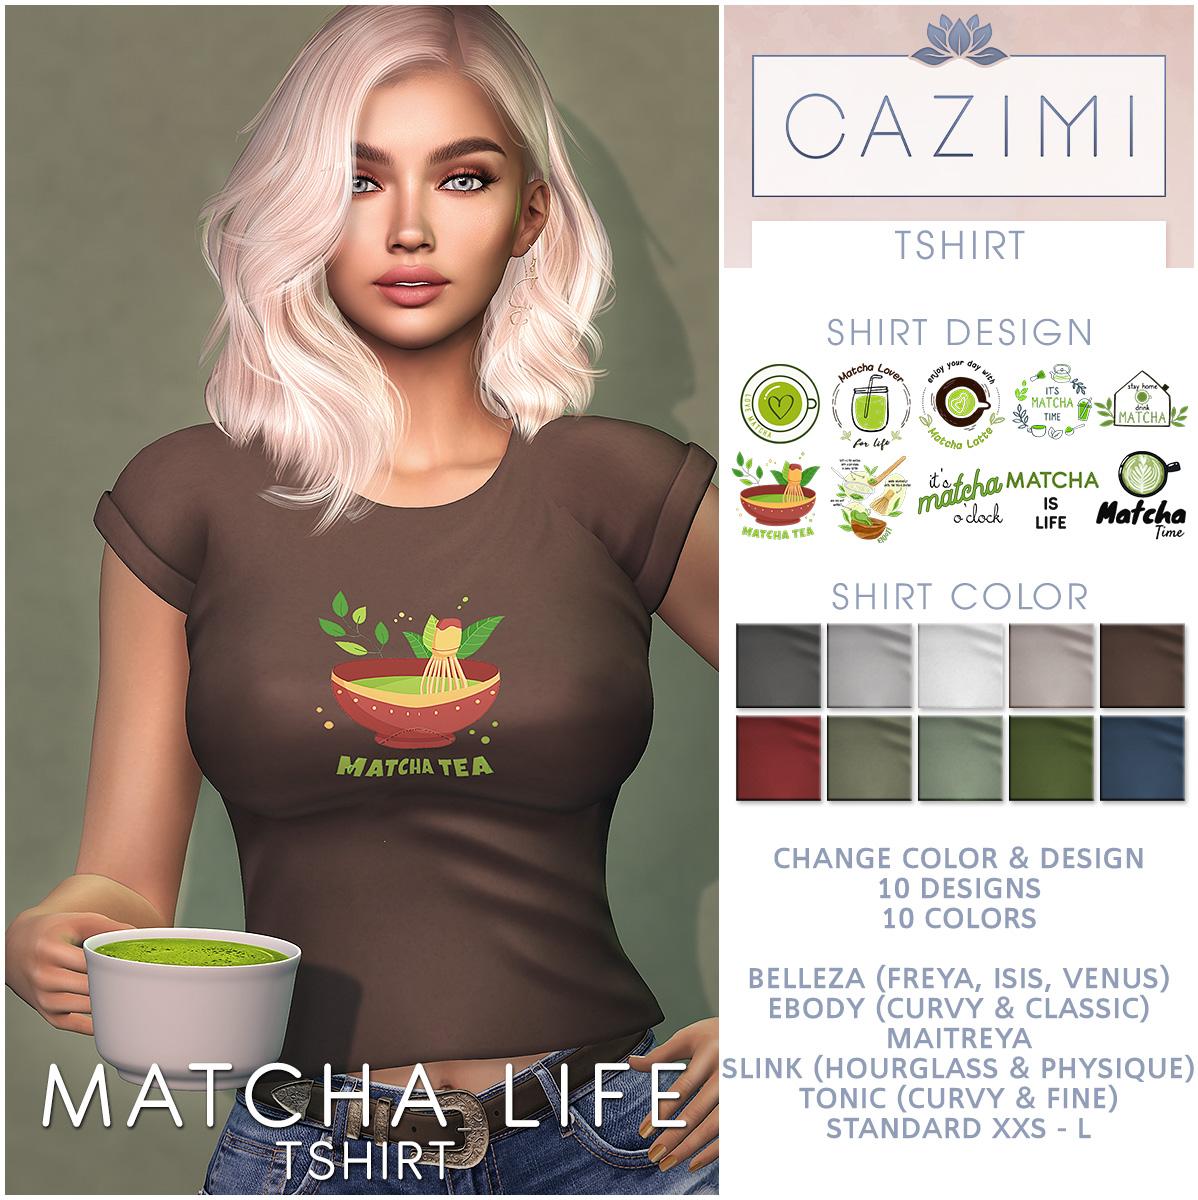 MatchaLife_Ad_1x1_Shirt.jpg